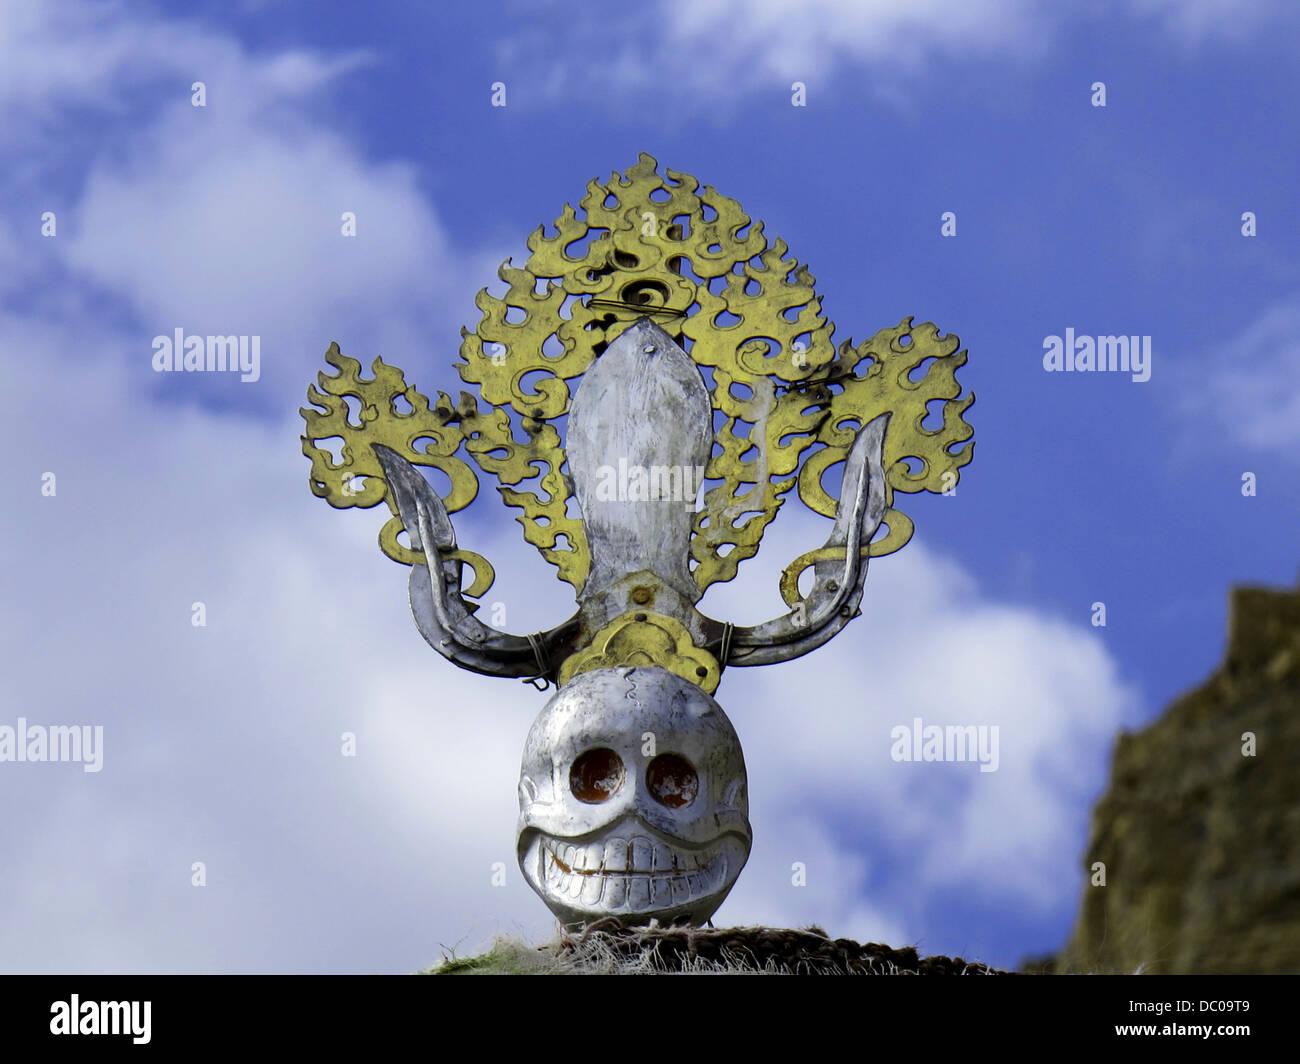 Tantric Stock Photos & Tantric Stock Images - Alamy